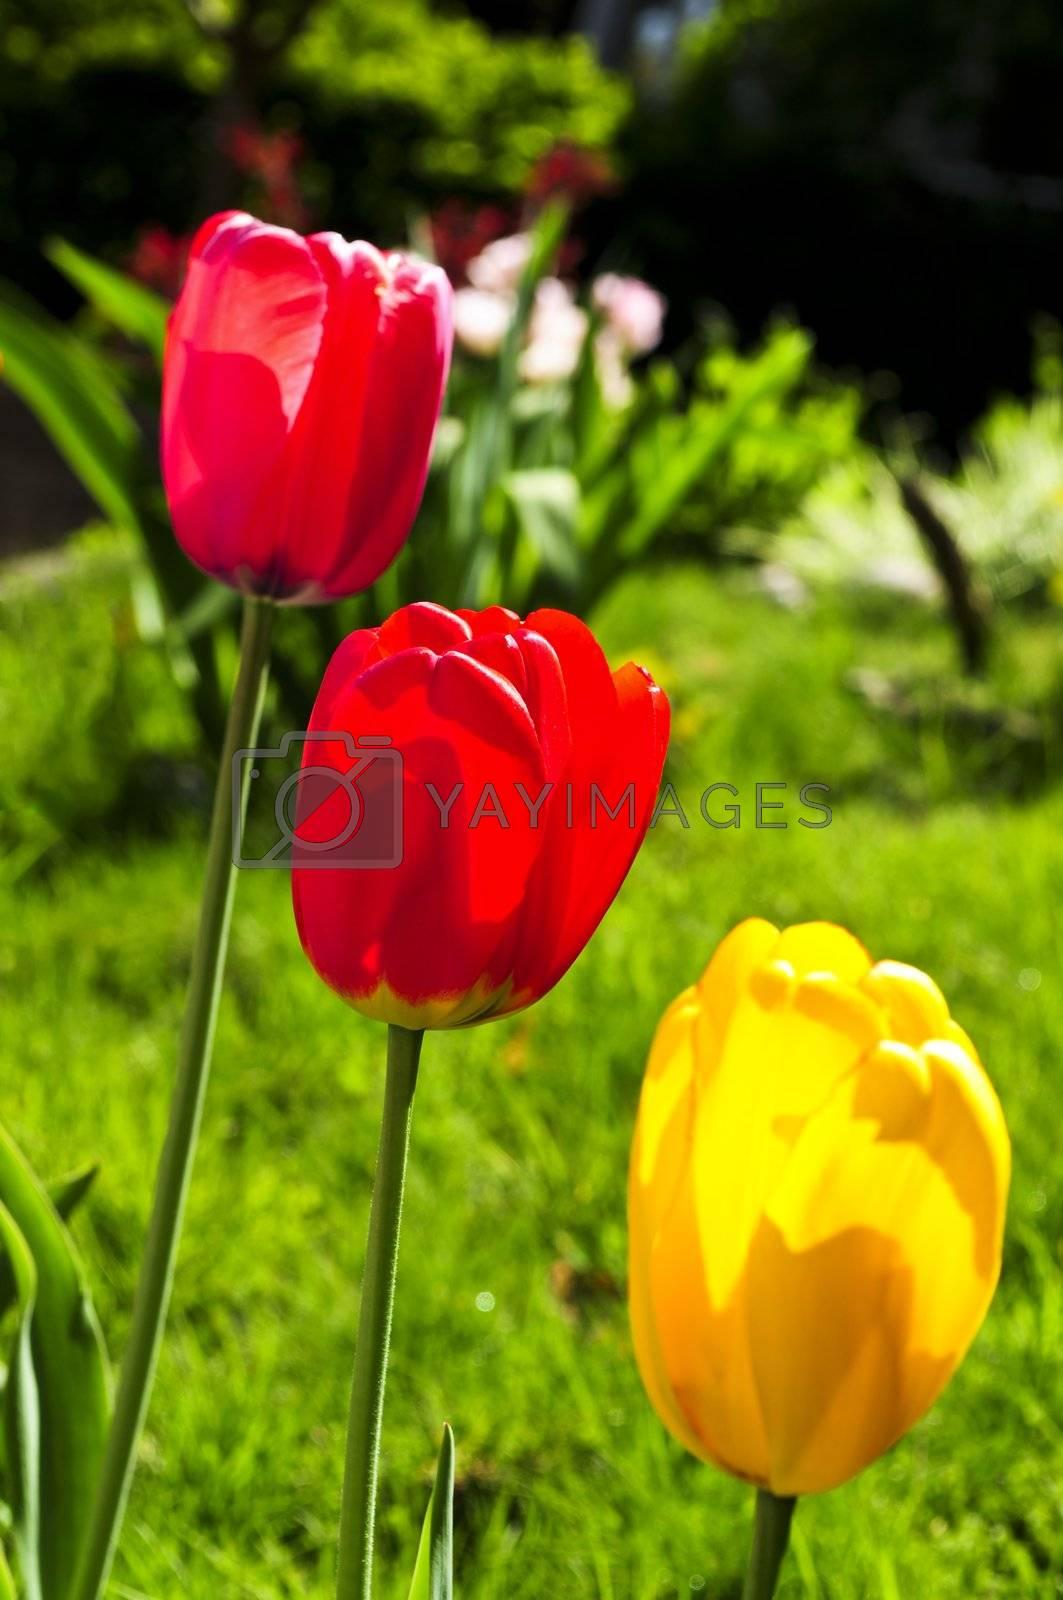 Tulips in spring garden by elenathewise